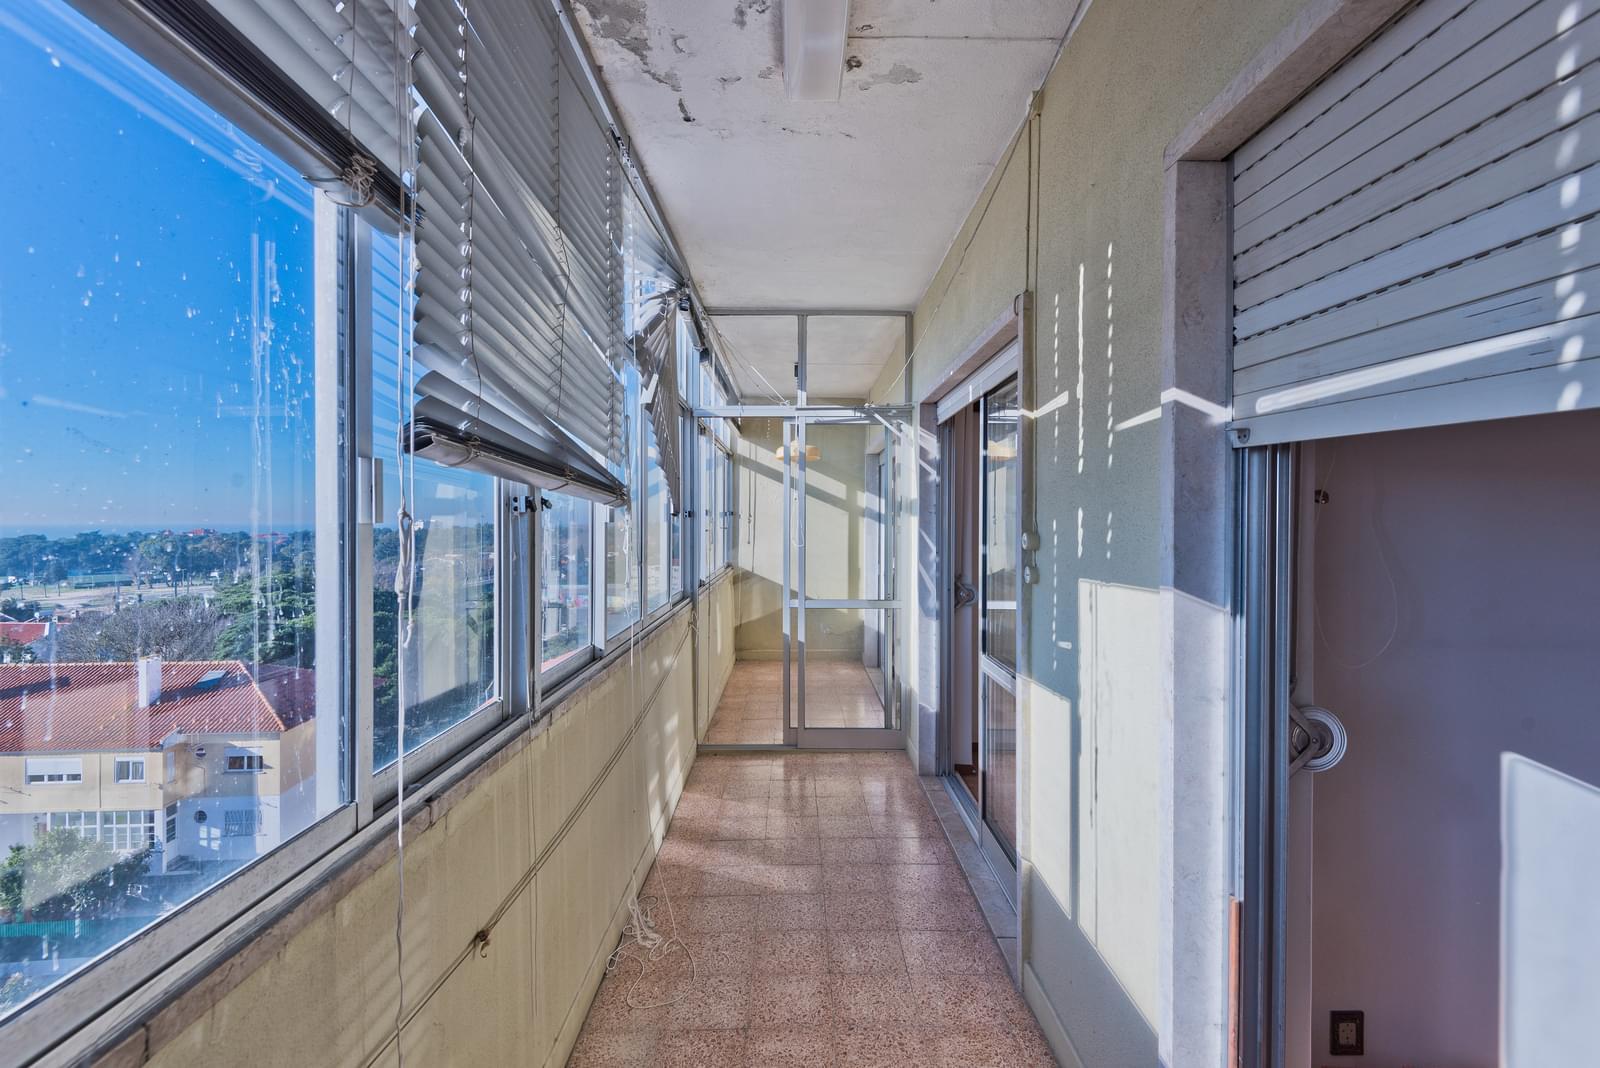 pf18965-apartamento-t2-1-cascais-4251cbd1-4d2c-48ea-a126-a7a5d53eb9e6